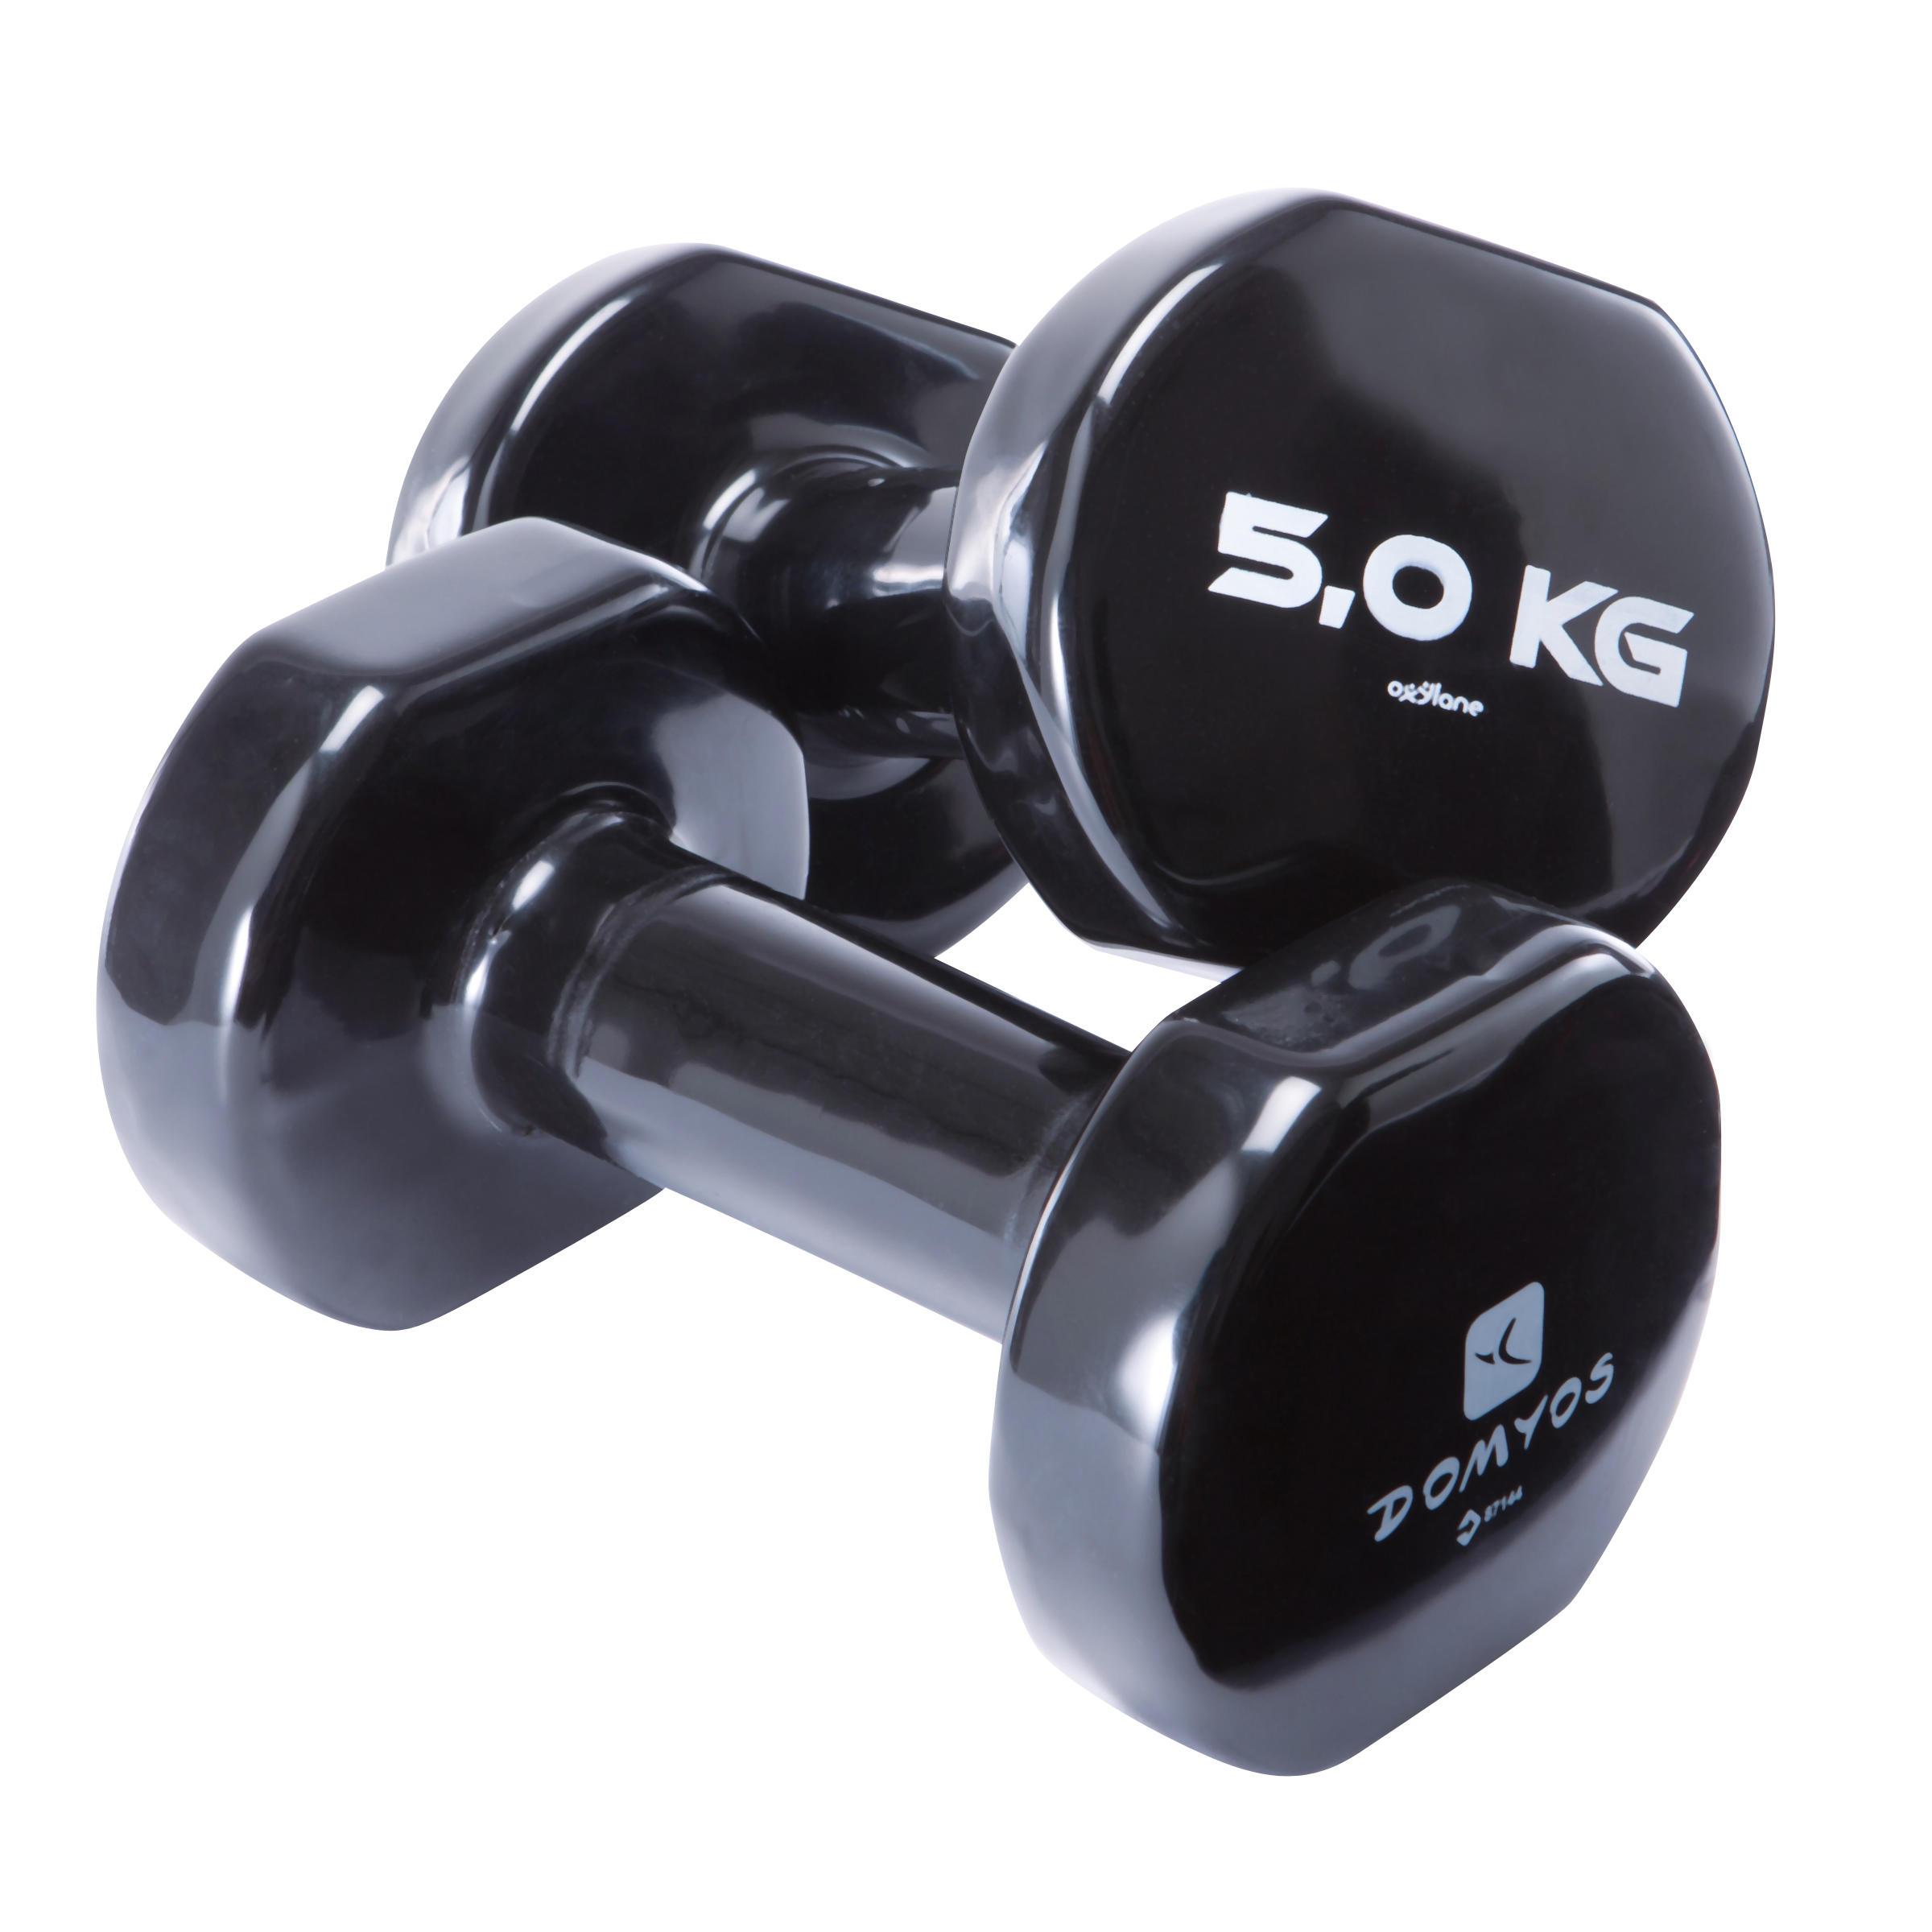 Pilates Toning Dumbbells Twin-Pack 5 kg